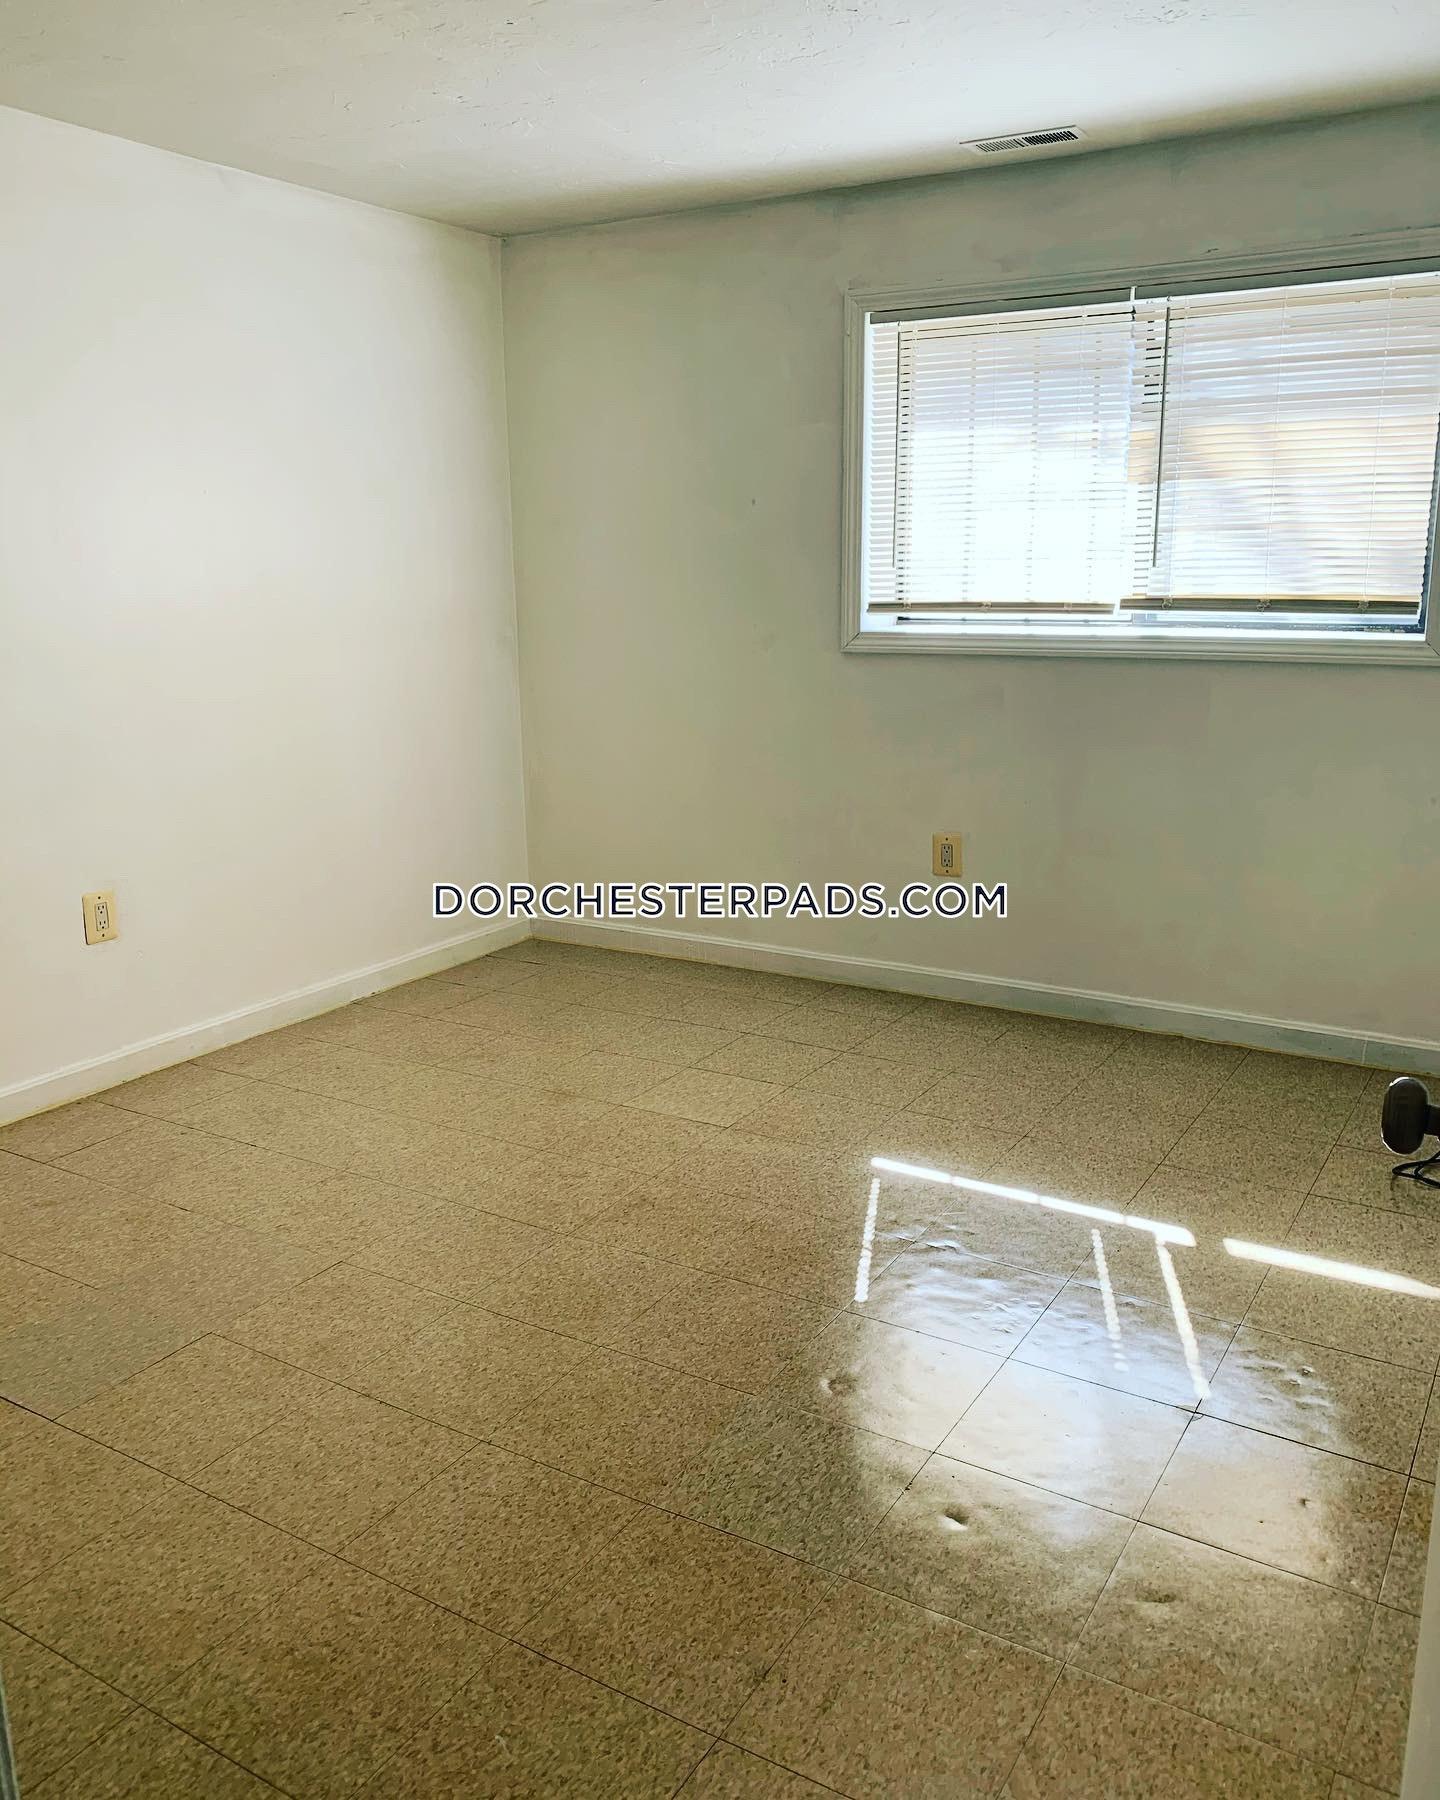 Apartments For Rent Arlington Ma: Dorchester Apartment For Rent 3 Bedrooms 1 Bath Boston